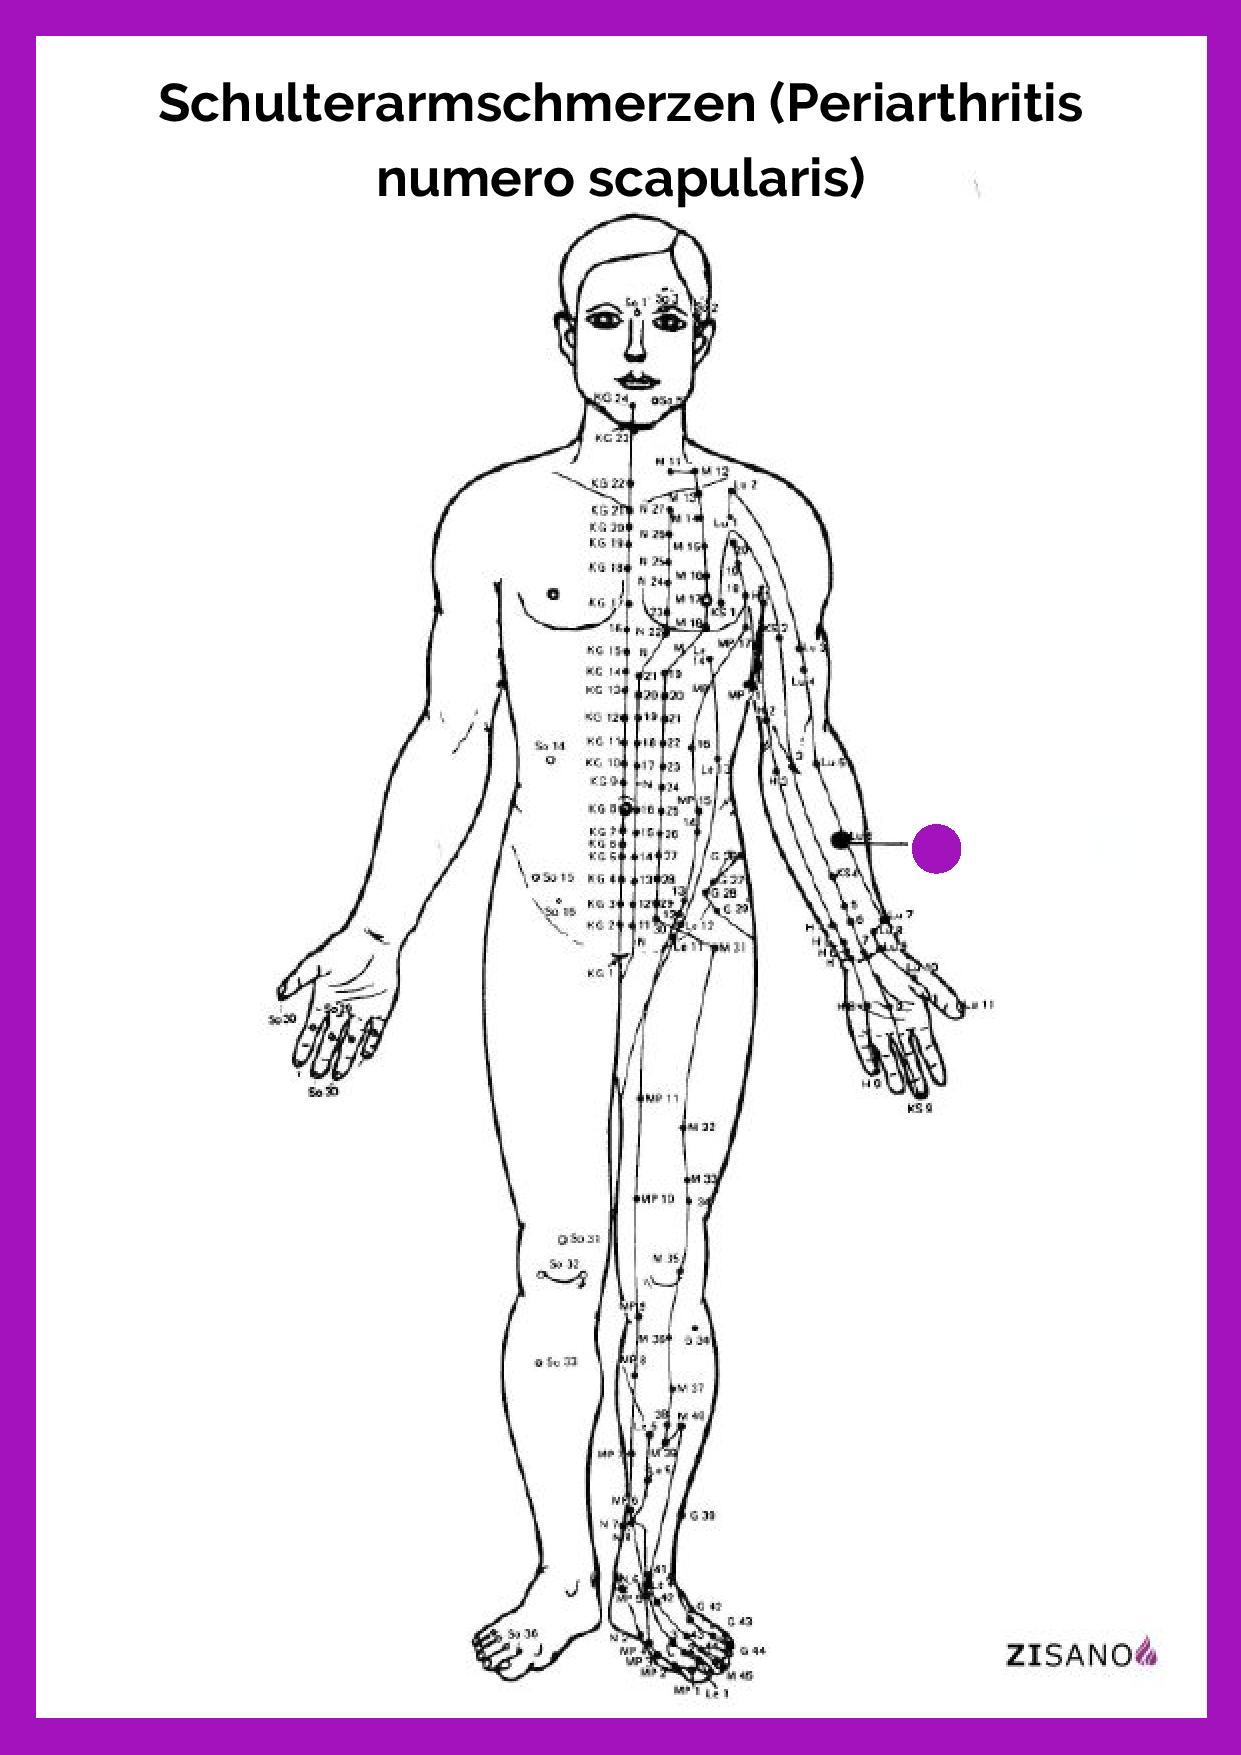 Meridiane - Schulterarmschmerzen - Beschwerden